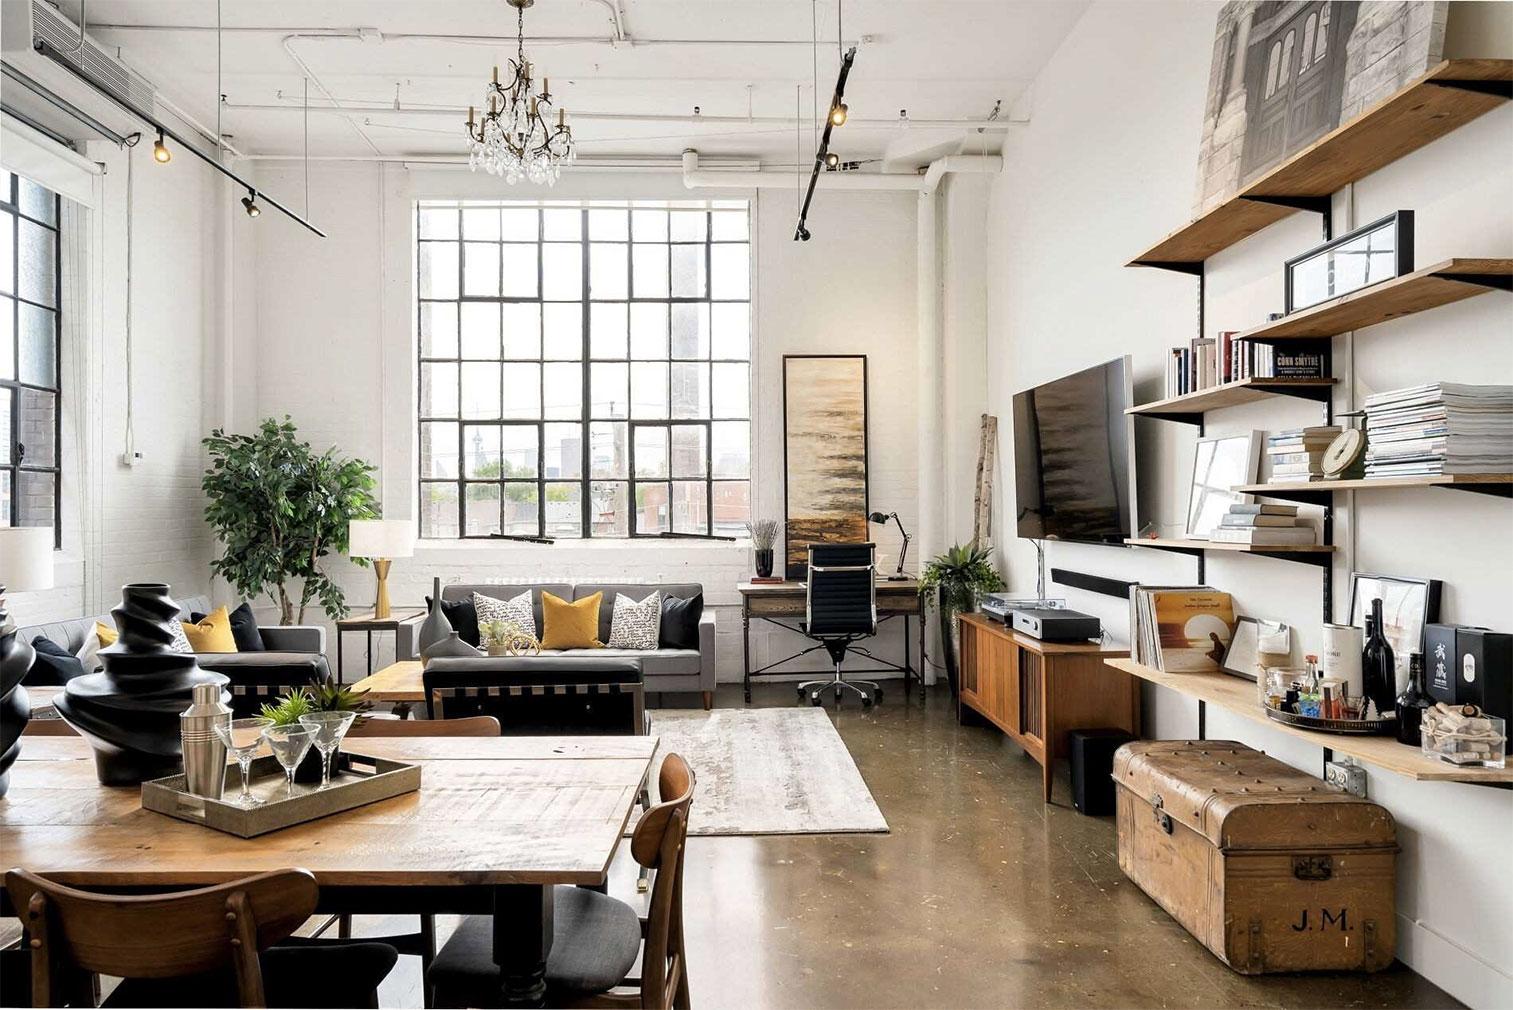 Hard loft living: the warehouse loft has 13.6-ft-high ceilings and polished concrete floors